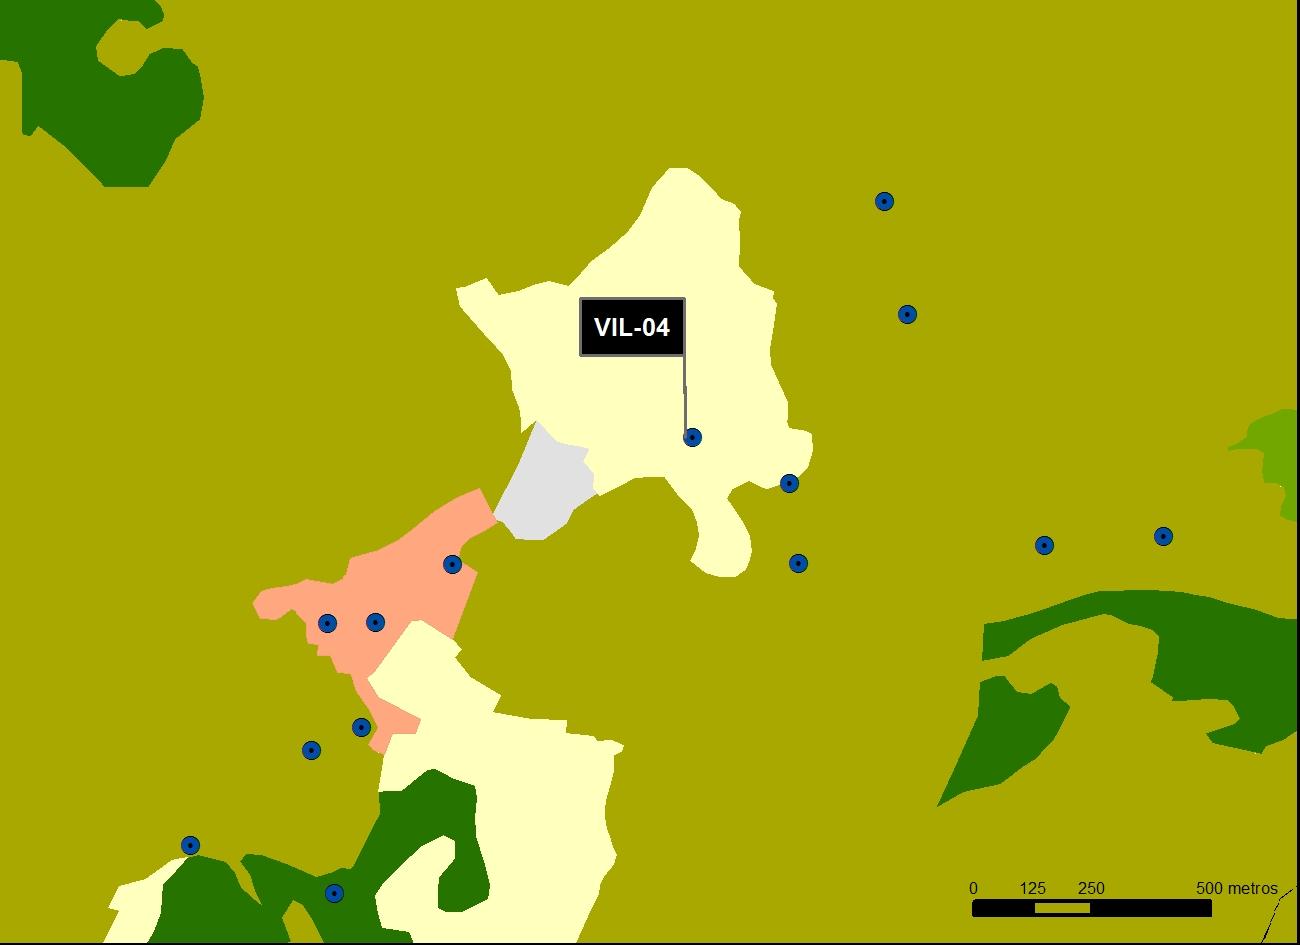 VIL_04_M.V.LOZANO_ELEGIDO_MAP.VEG